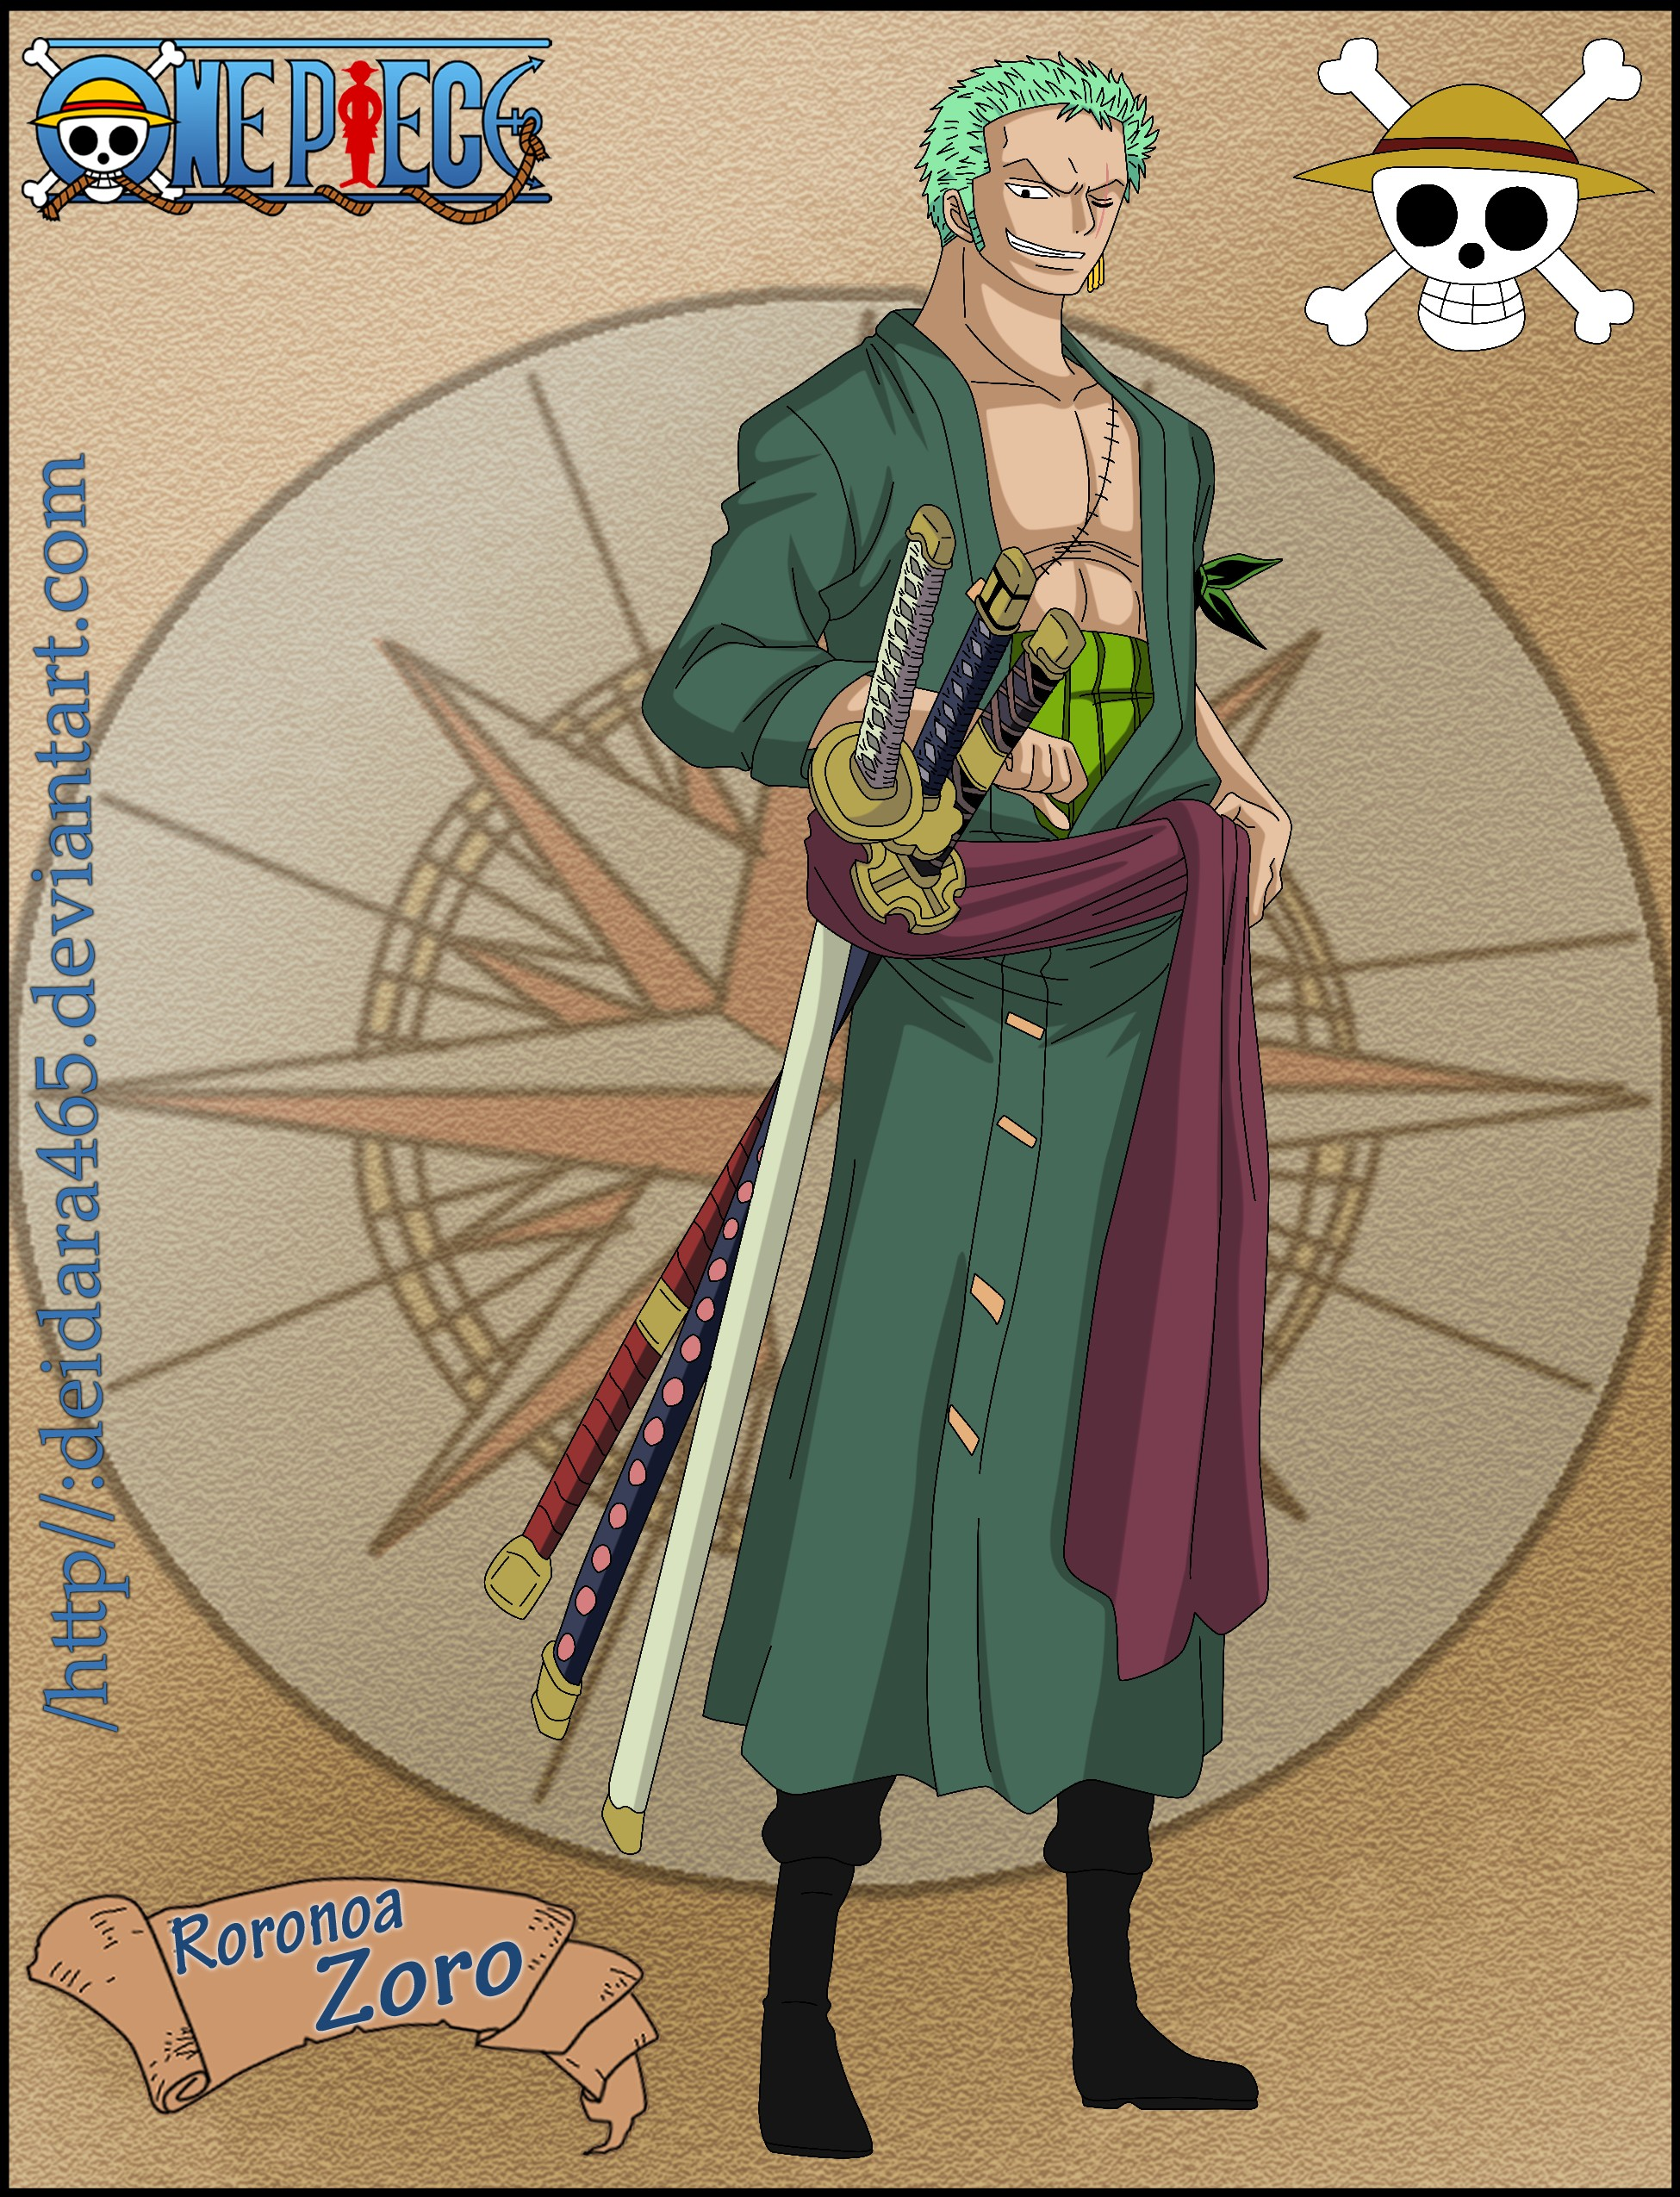 Roronoa Zoro - ONE PIECE - Image #936800 - Zerochan Anime ...